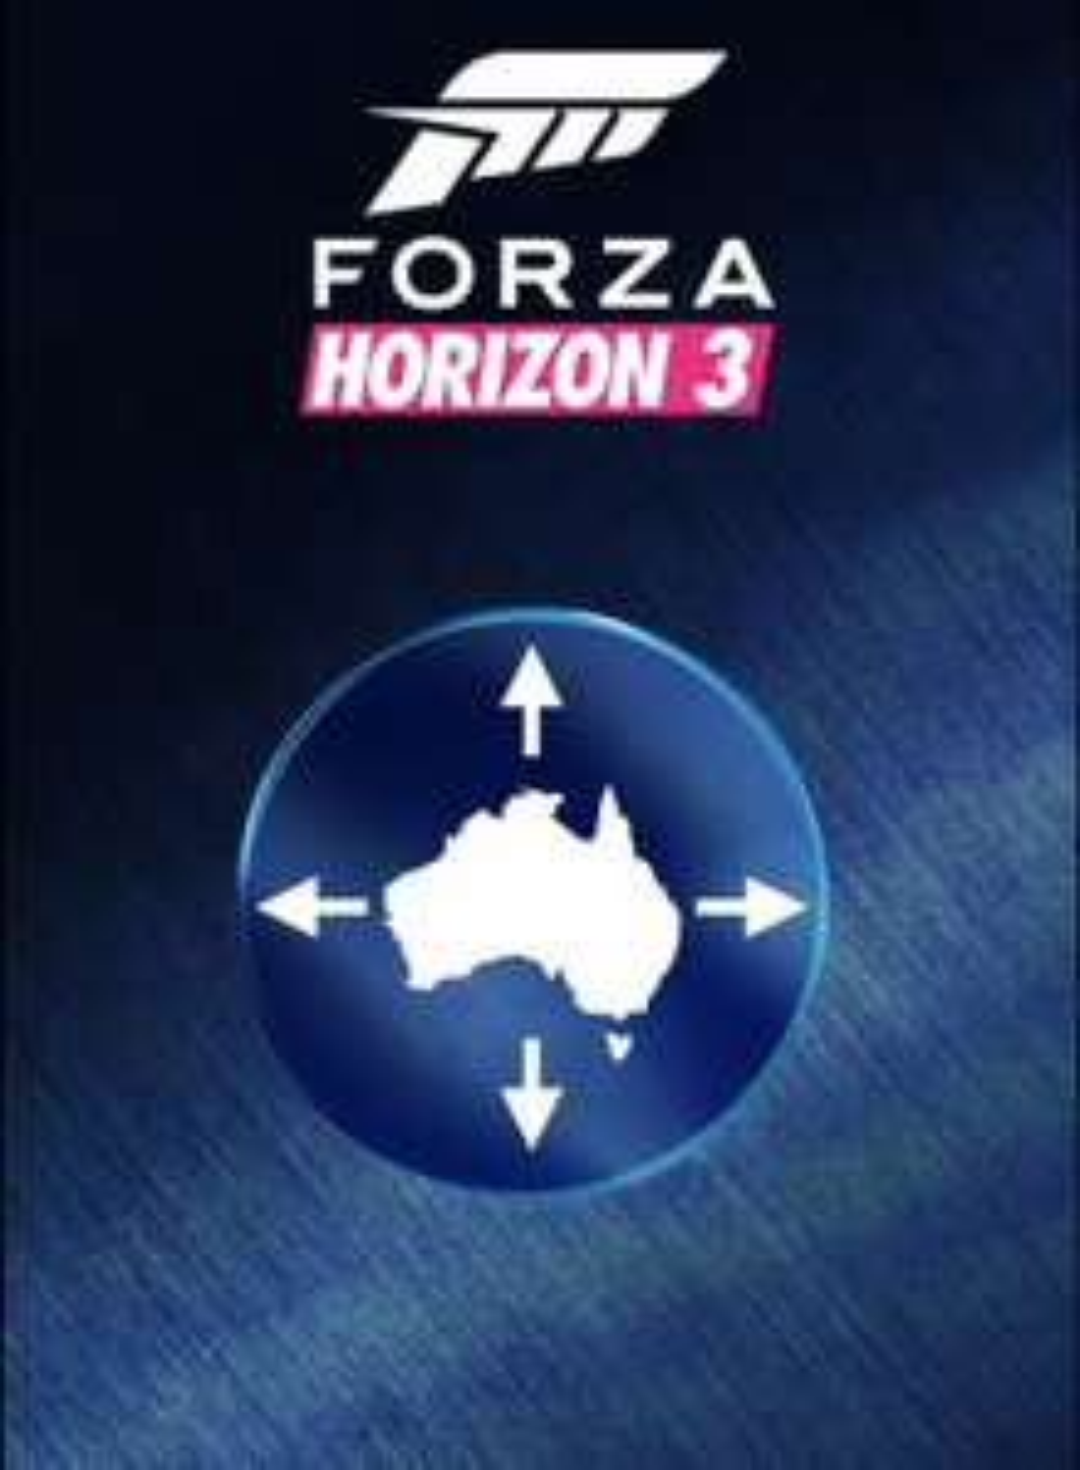 Pass Extension Forza Horizon 3 sur Xbox One & PC Windows 10 (Dématérialisé - Xbox Play Anywhere)